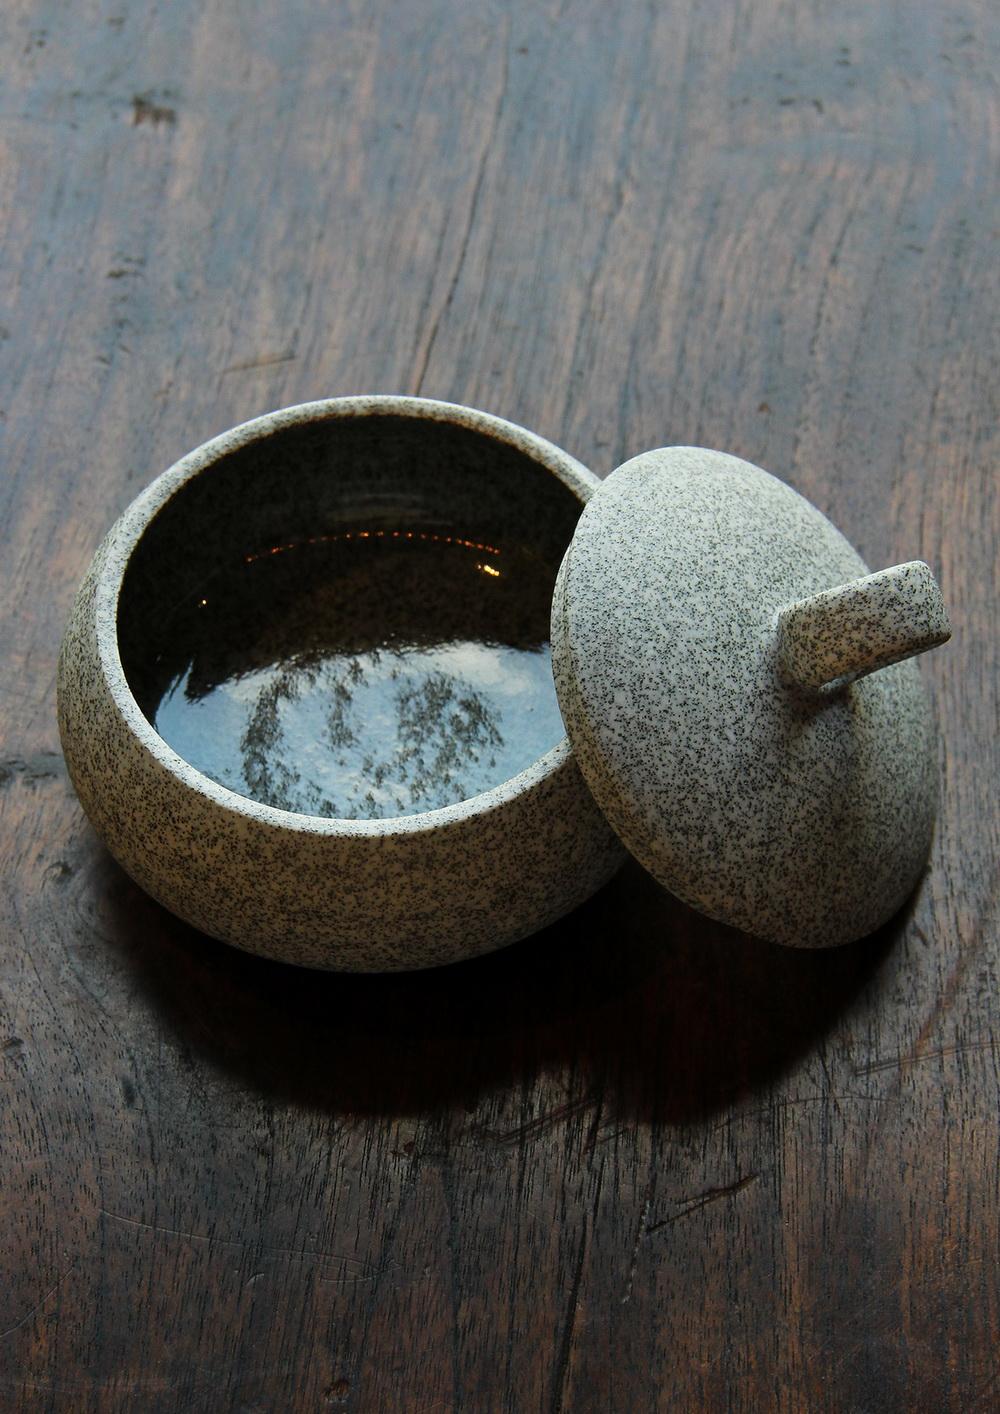 sandy sugar holder open lid.JPG